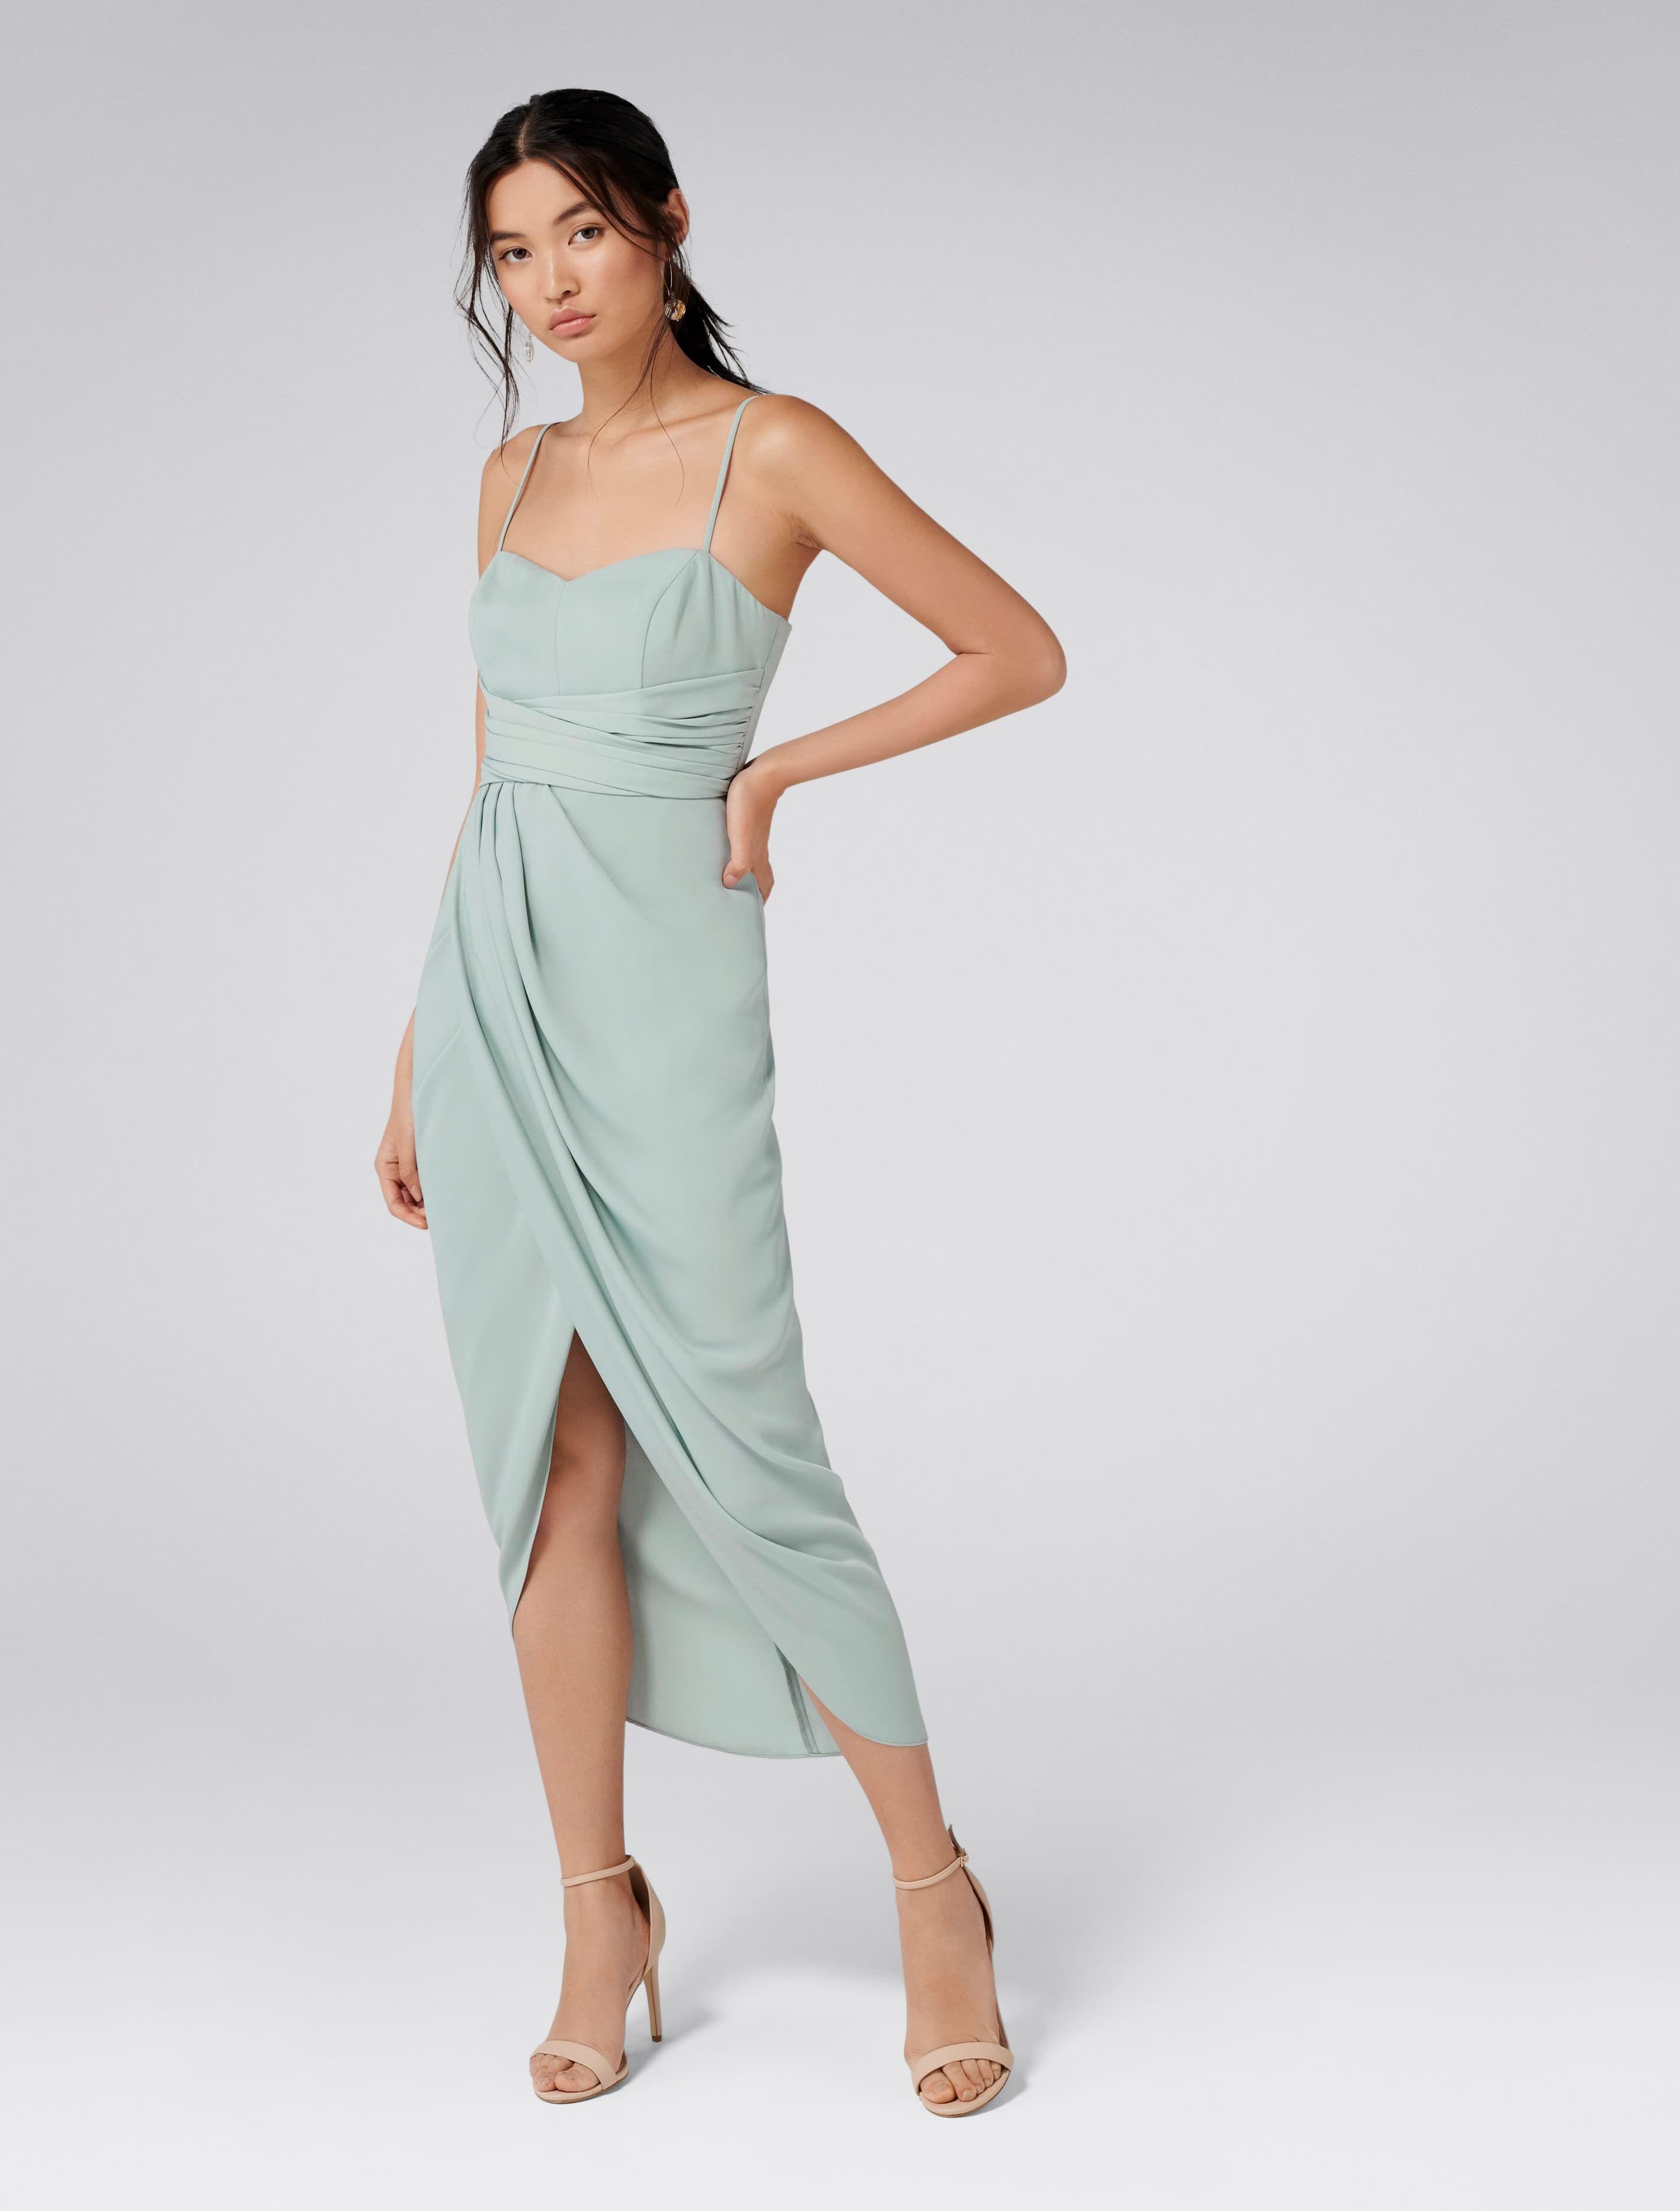 Forever Now Whitney Sweetheart Drape Maxi Dress Mint Bridesmaid Dress Jade Mist Tulip Midi Dress [ 3742 x 2844 Pixel ]